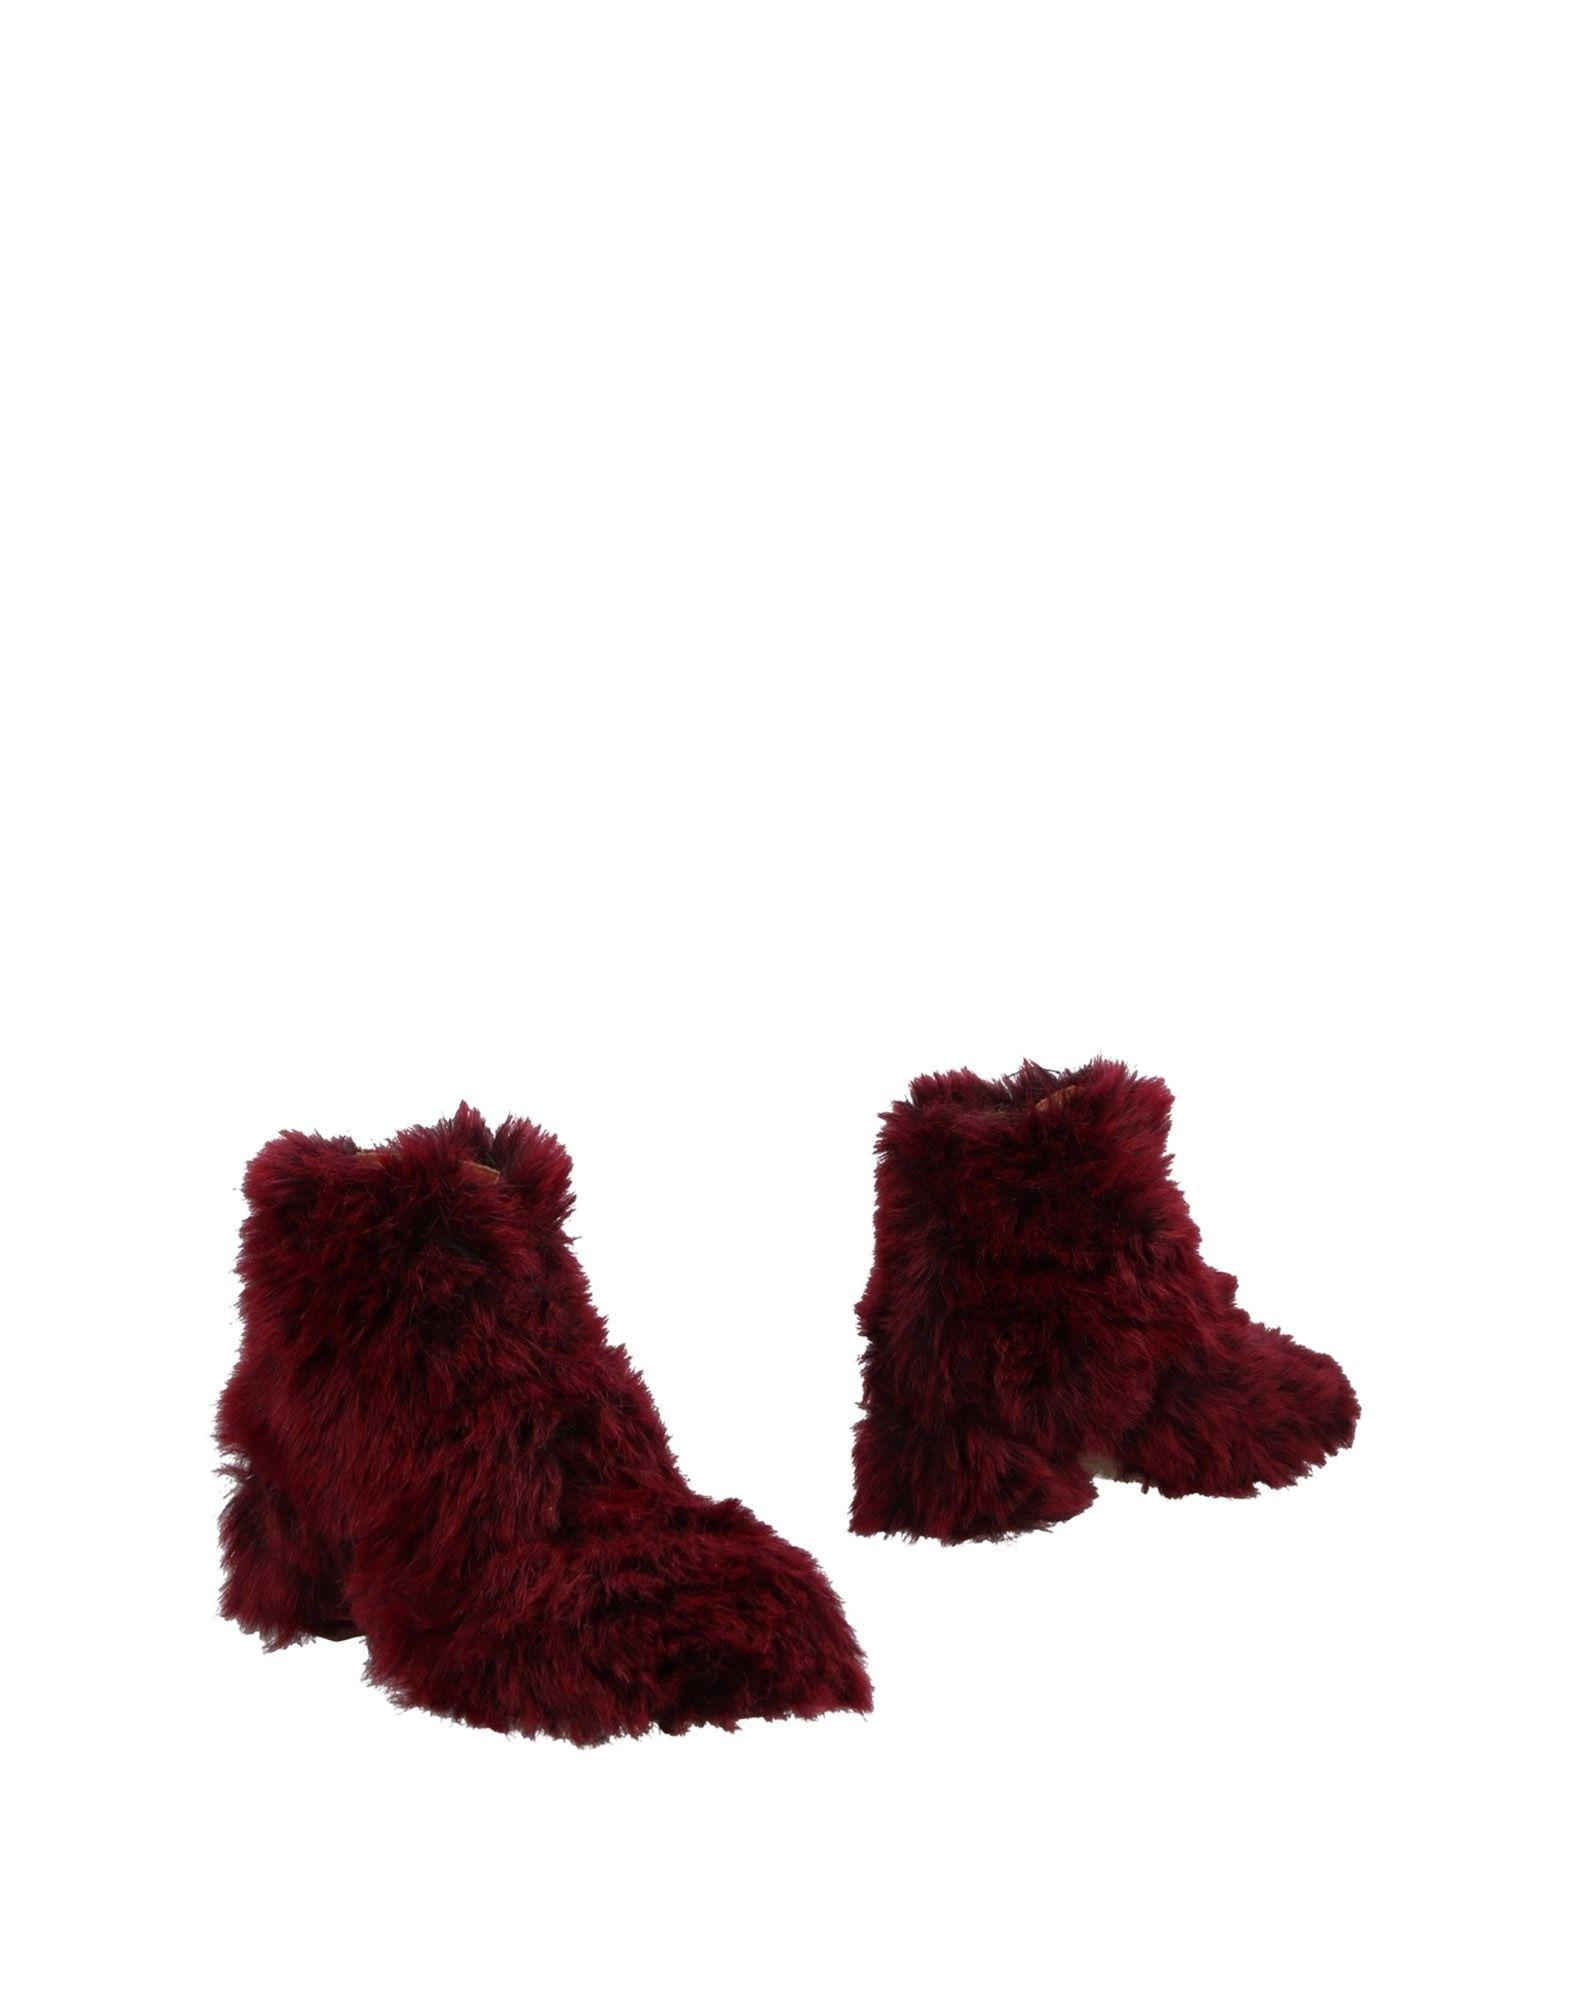 Bottine L'f Shoes Femme - Bottines L'f Shoes Aubergine Chaussures casual sauvages